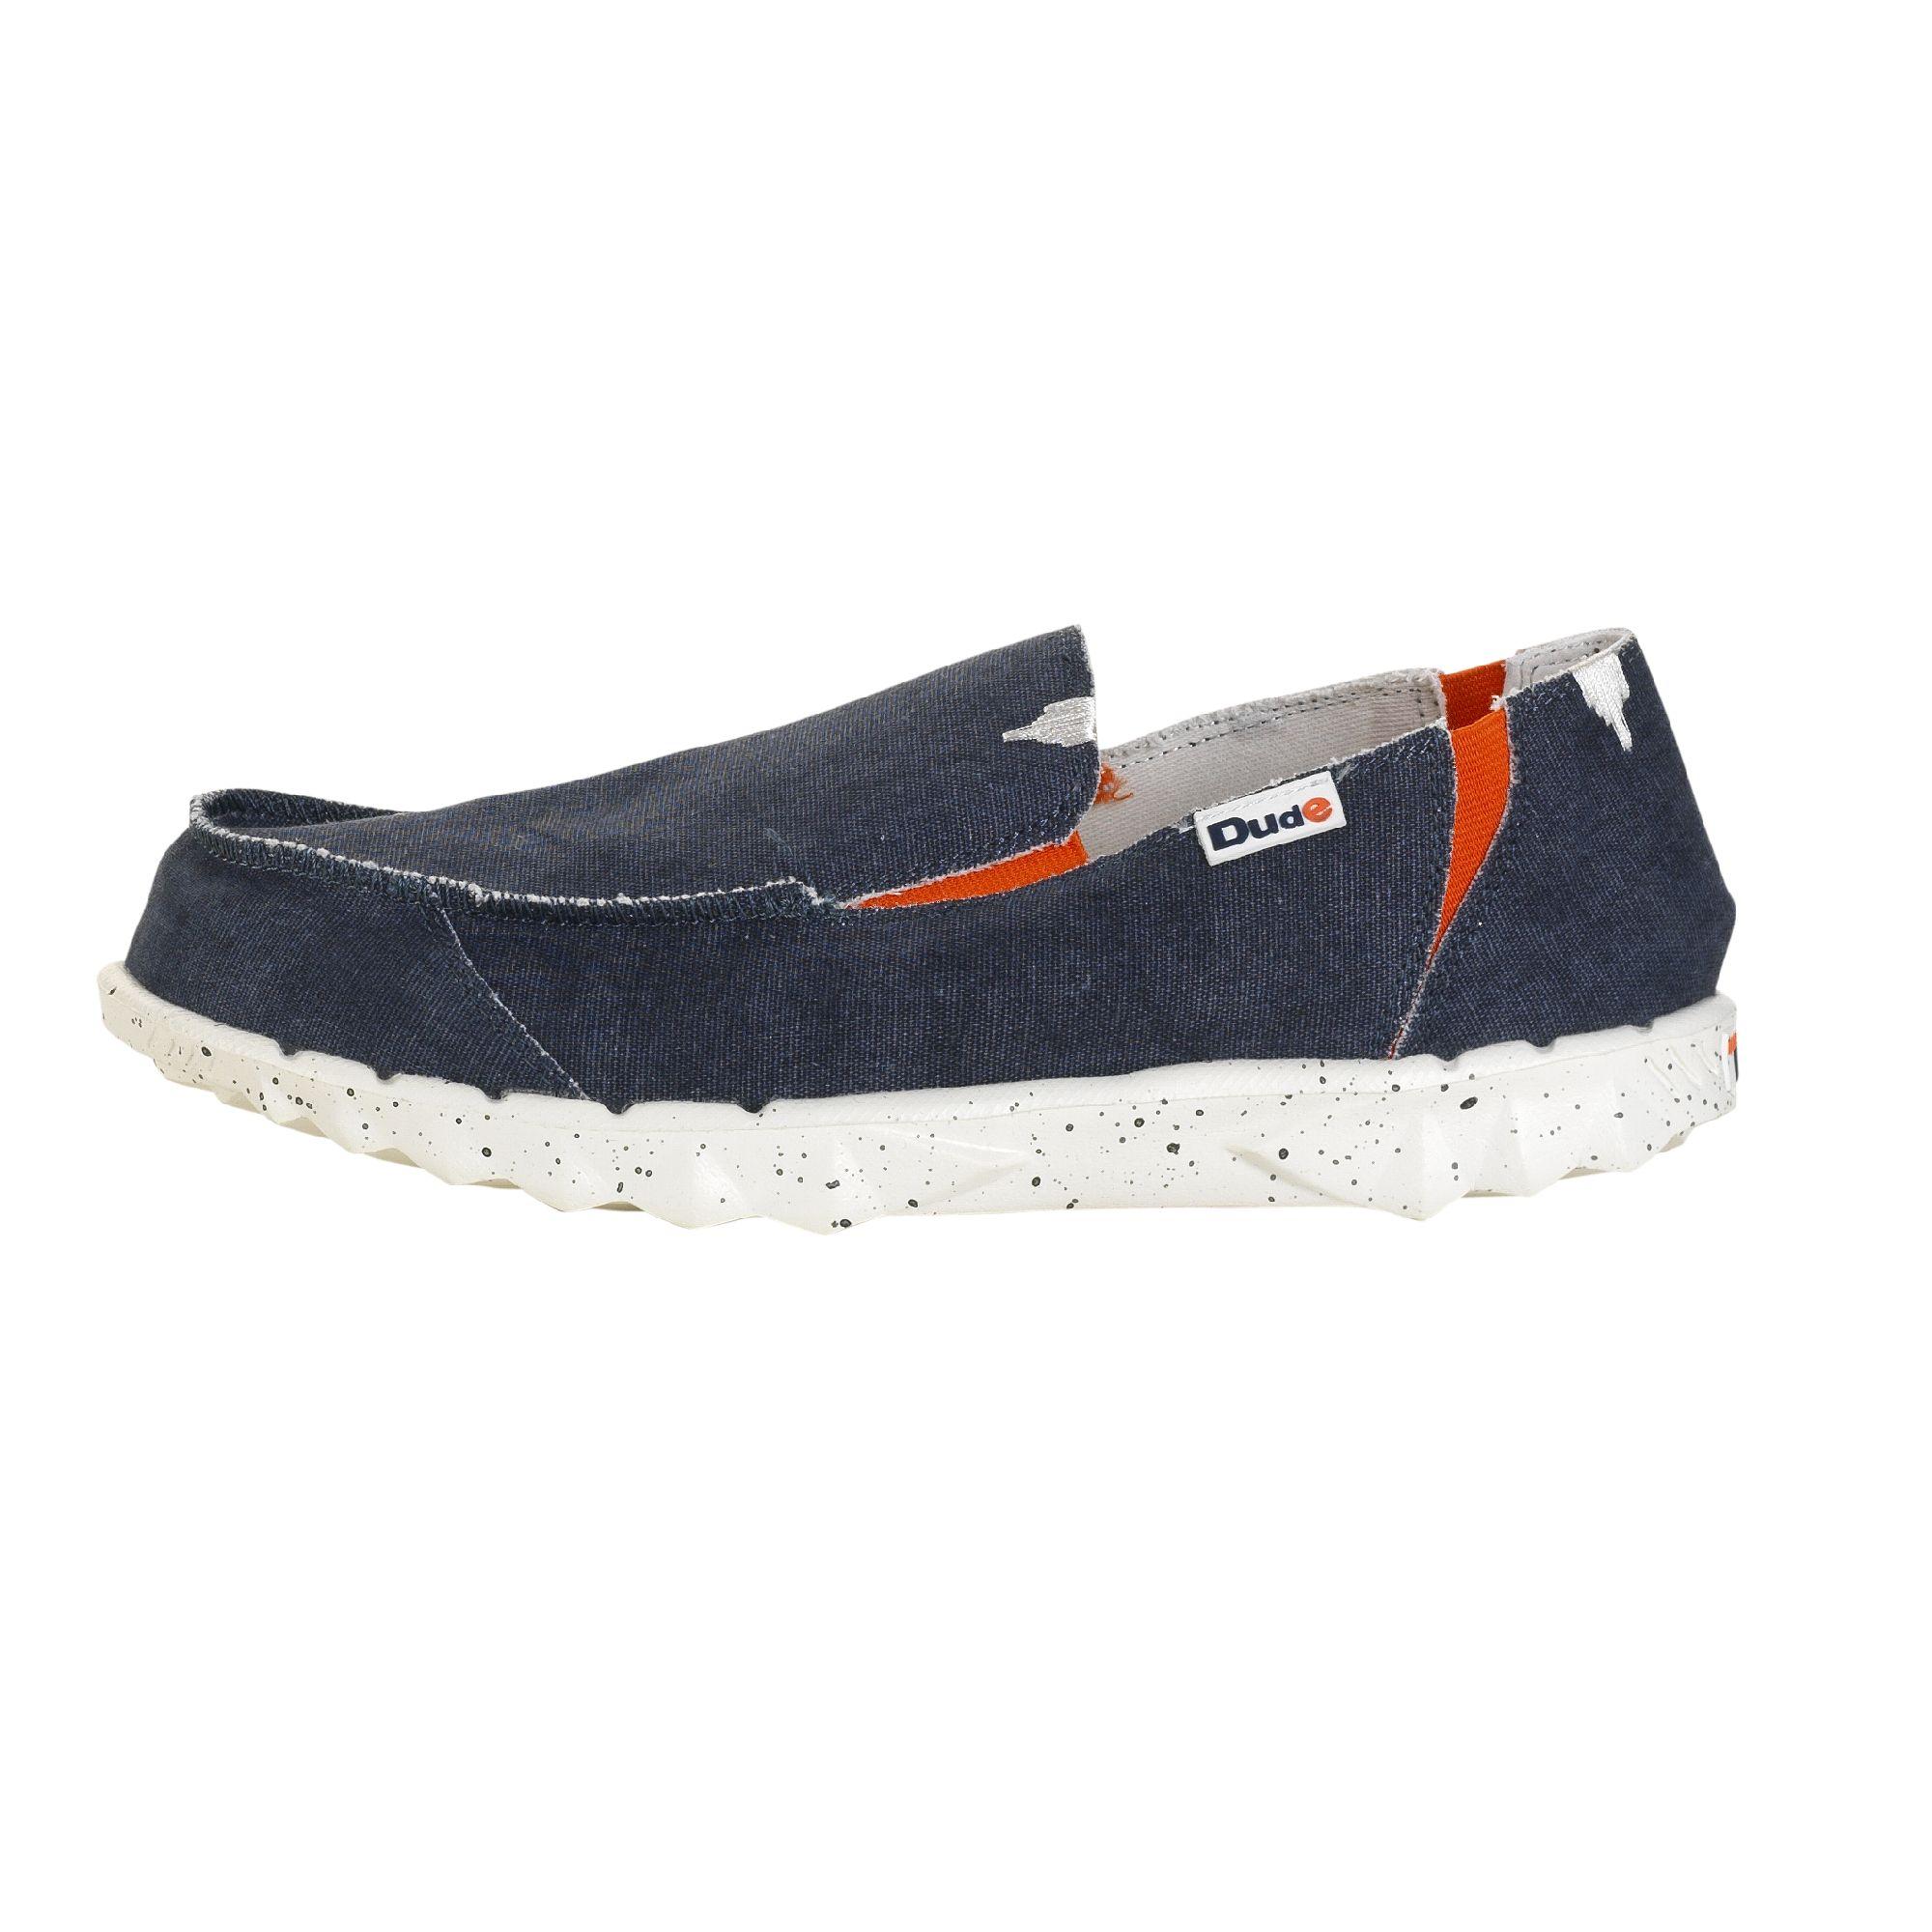 Chaussures Mec Funk Ava Slip Gris Uk3 / Eu36 Vn7Fdhzh